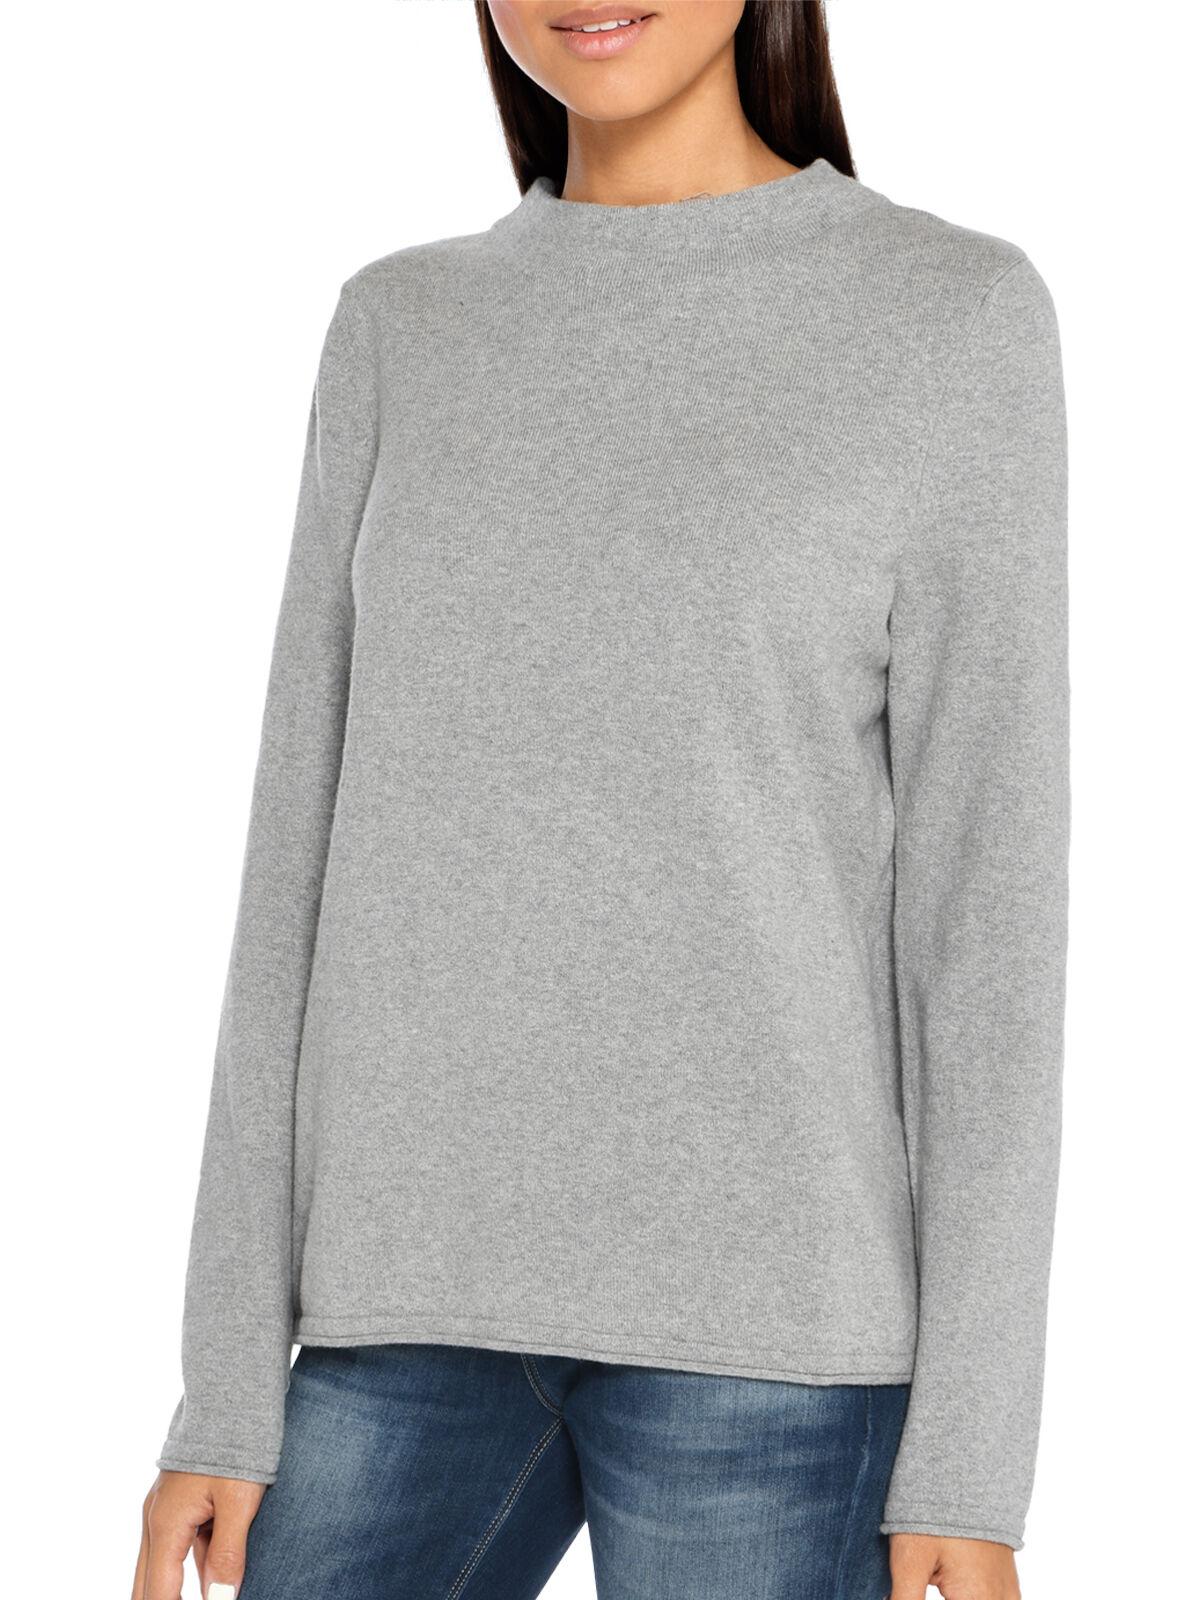 Marc O´Polo Sweatshirt 2 in 1 Look grau meliertweiß   dress